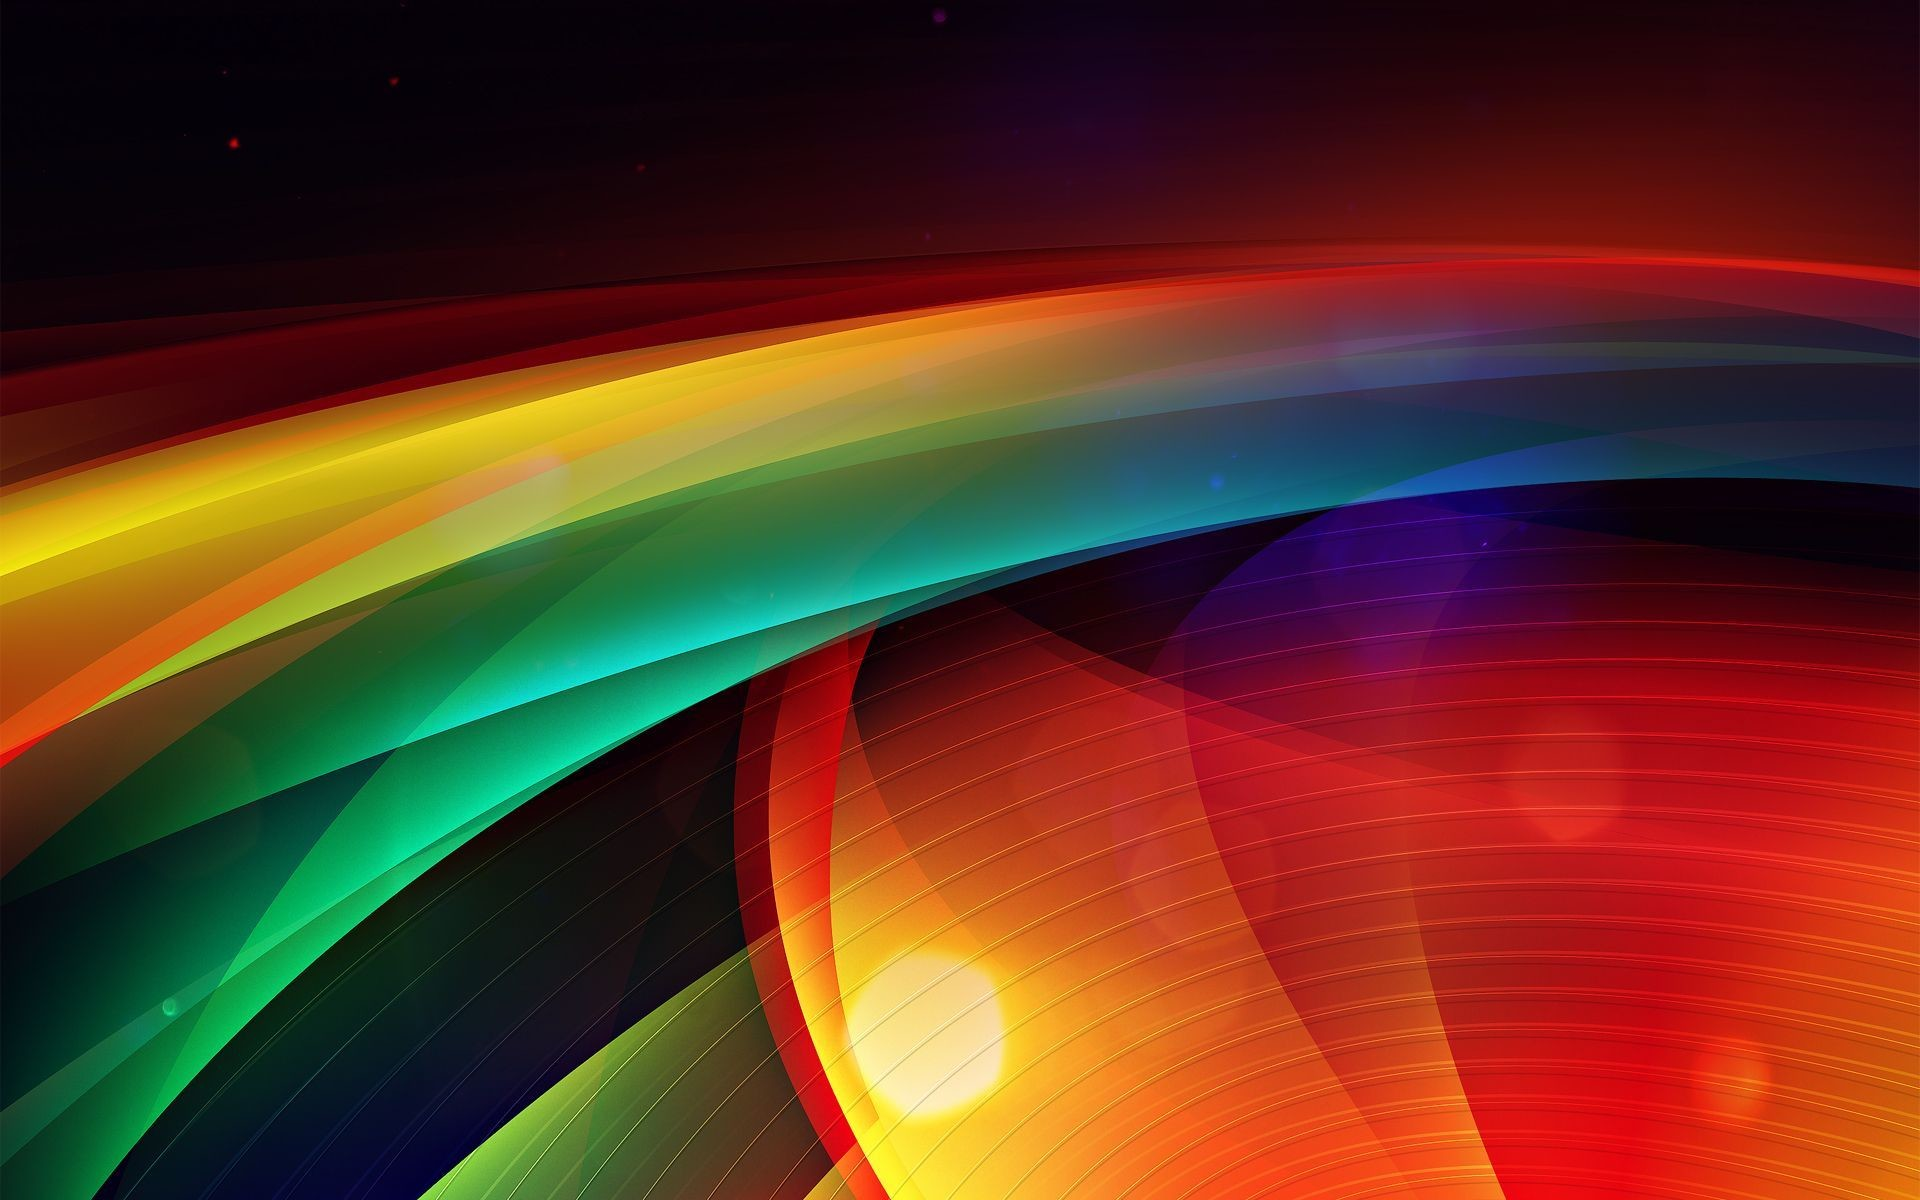 3d Hd Wallpapers 1080p – MP3 Music Downloads